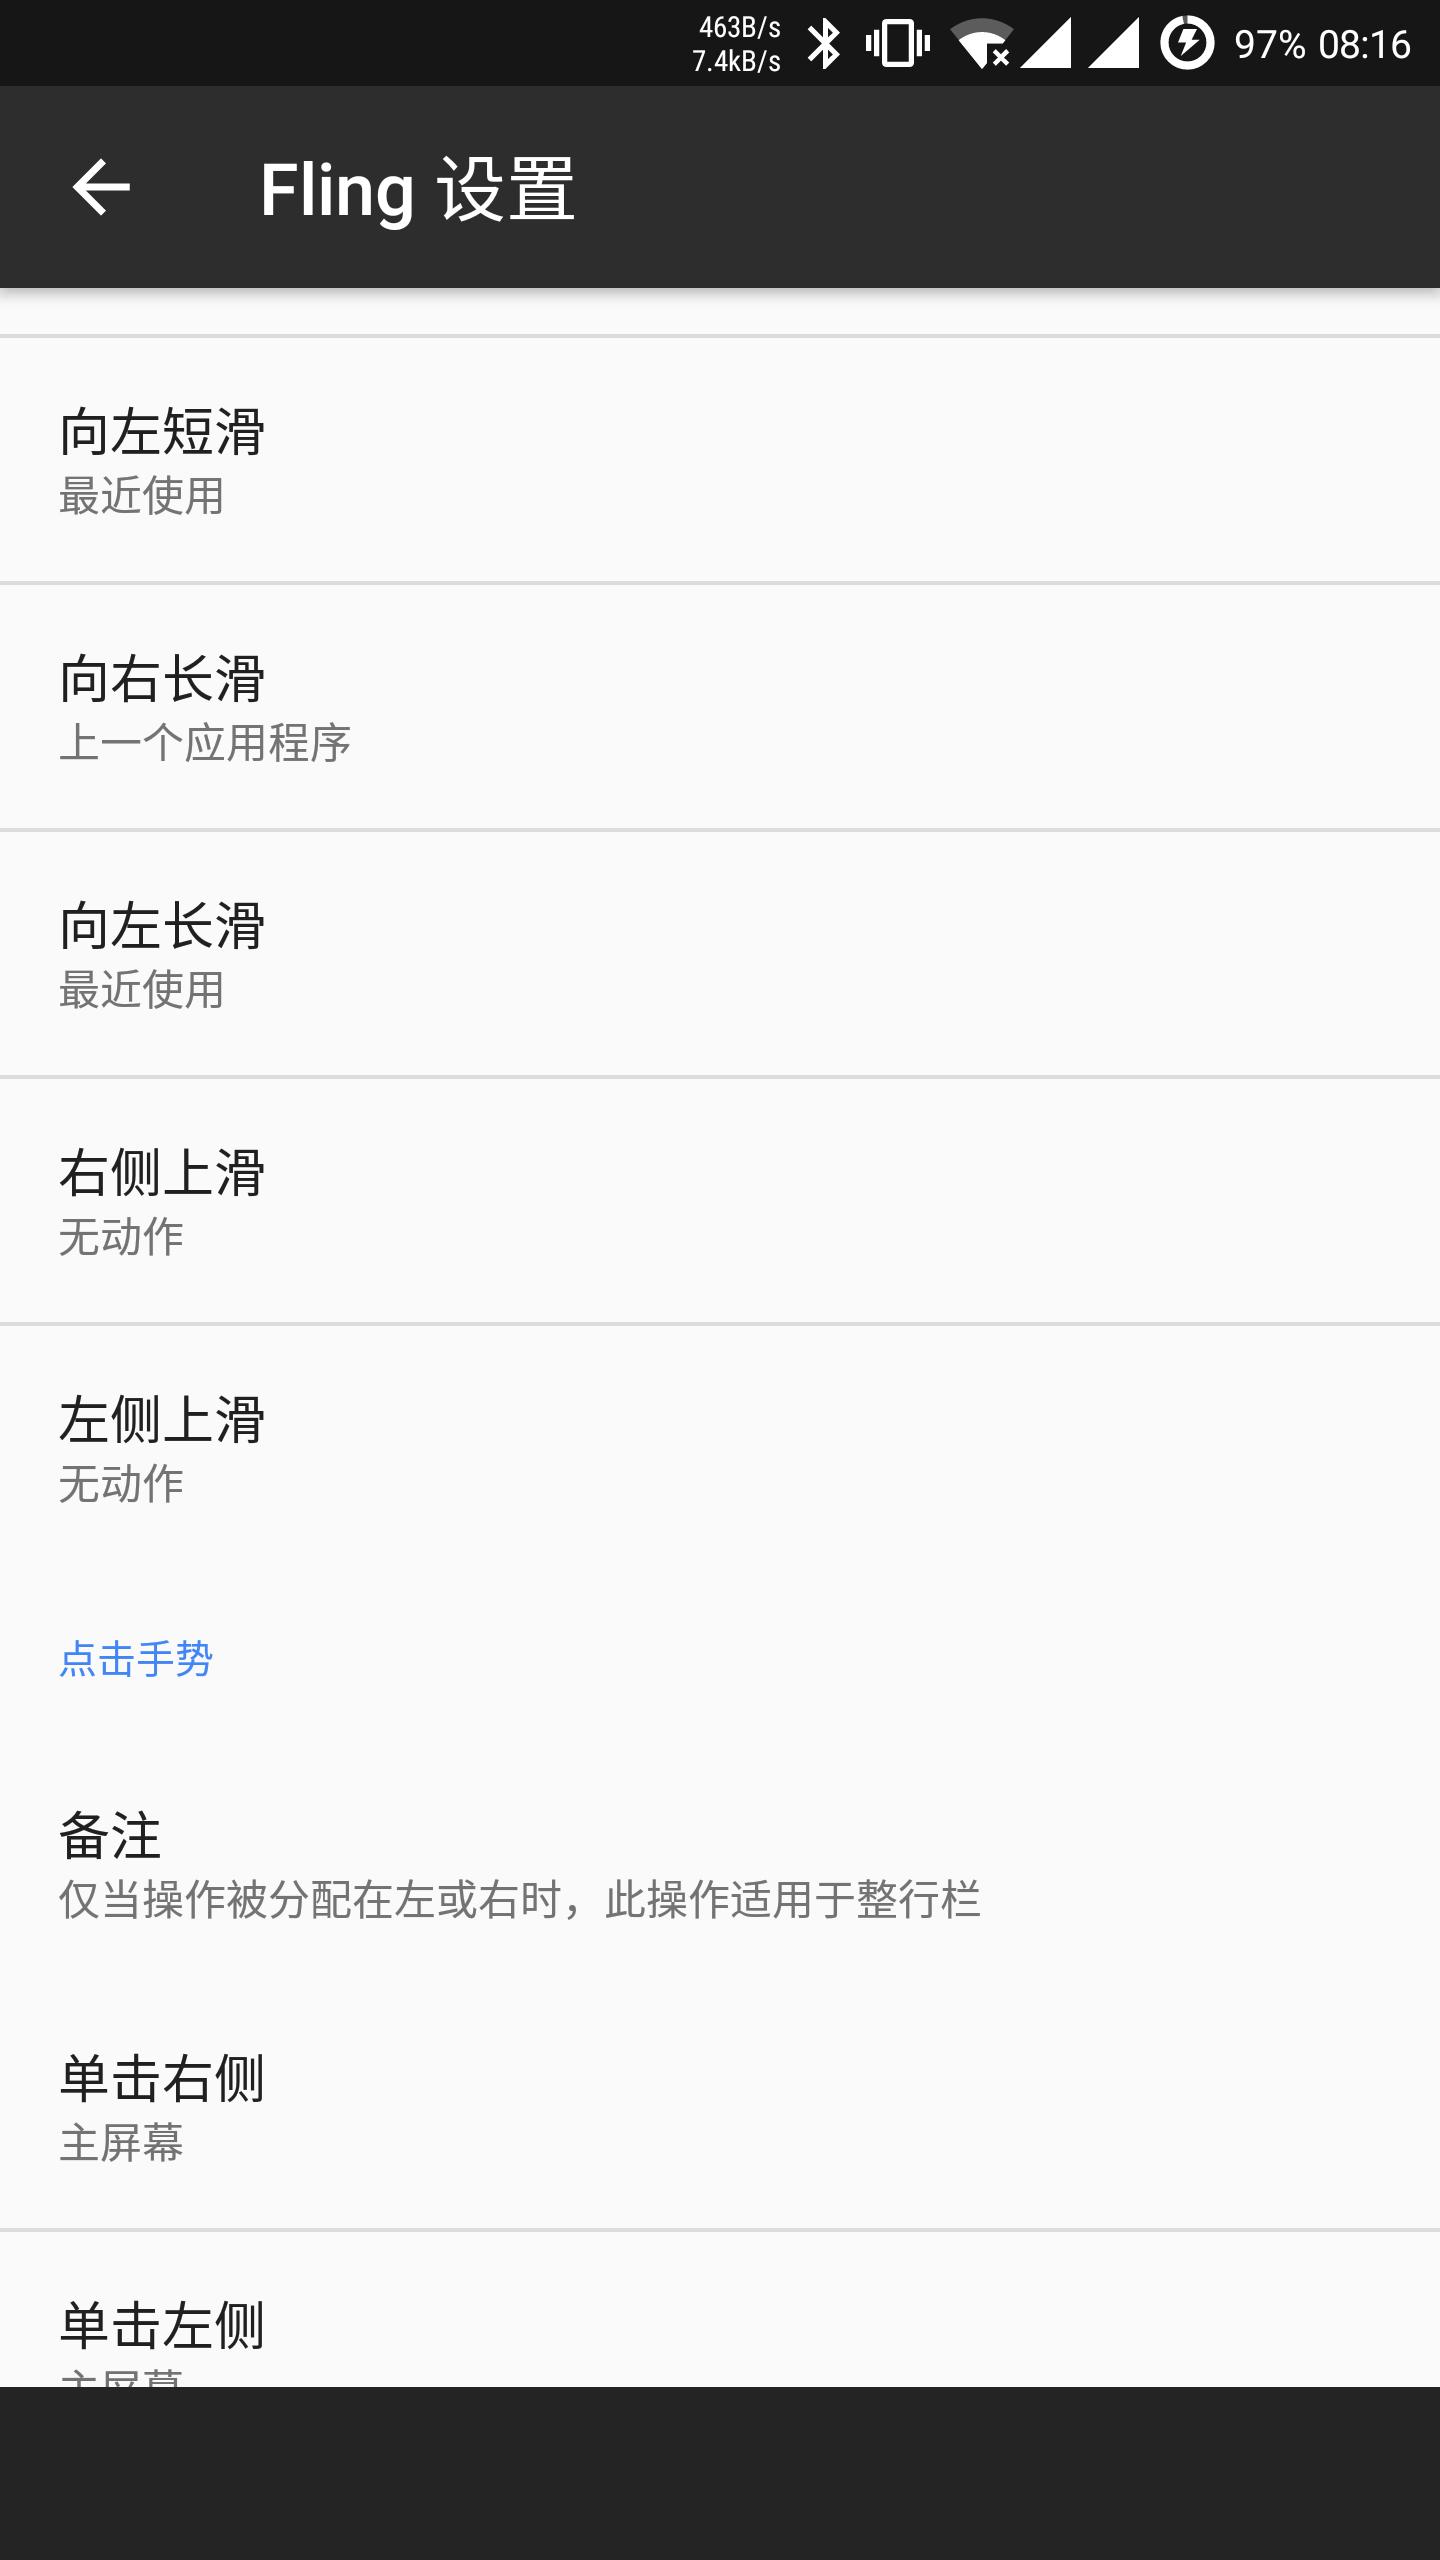 Screenshot_20170604-081626.png